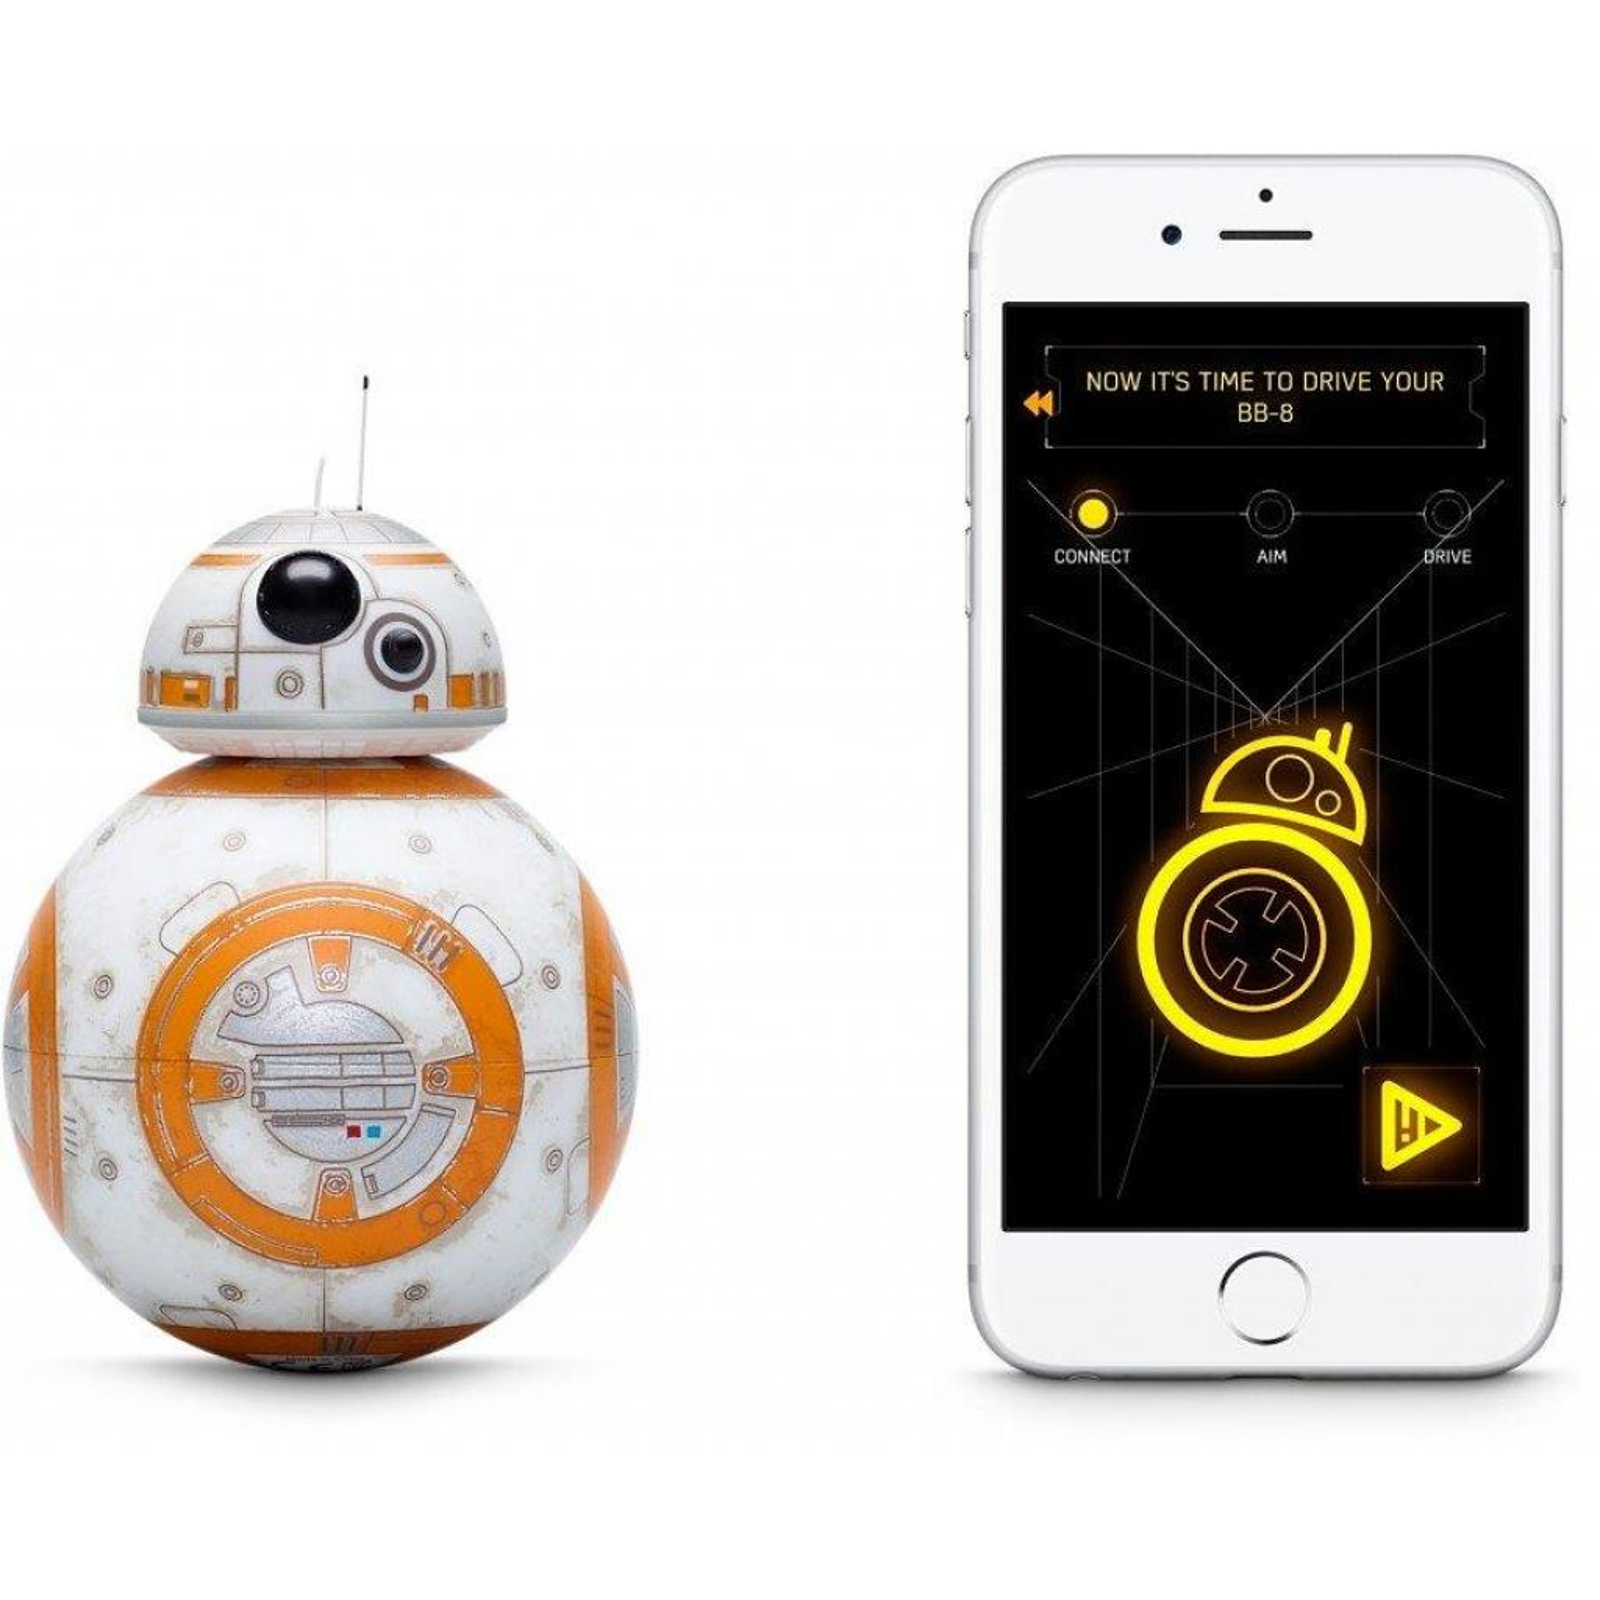 Робот Sphero BB-8 Special Edition with Force Band (322384) изображение 9